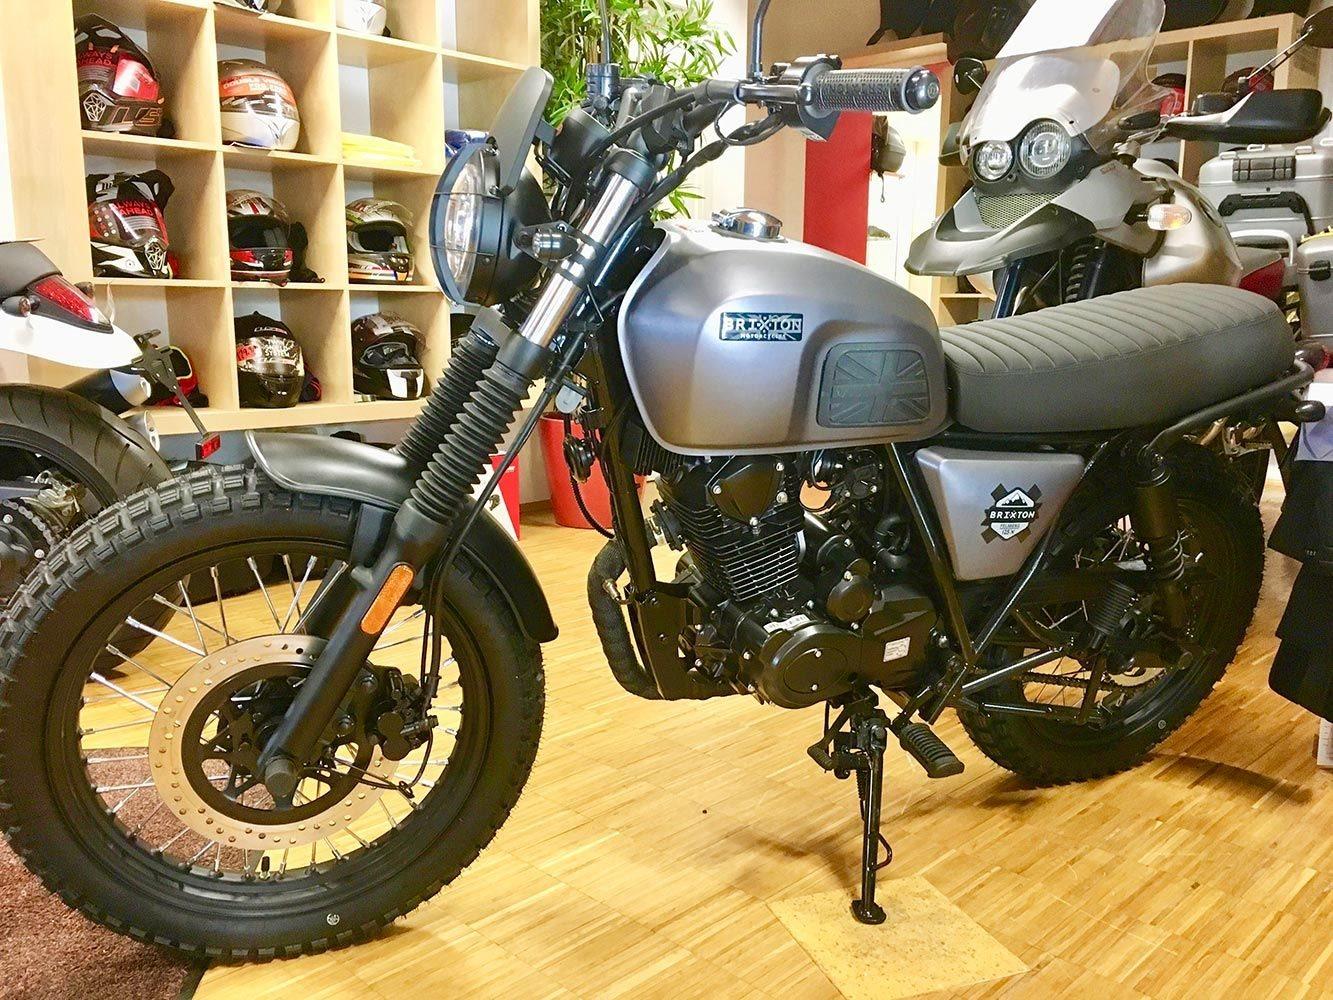 Neumotorrad: Brixton Felsberg 125 XC, Baujahr: 2020, 3.980